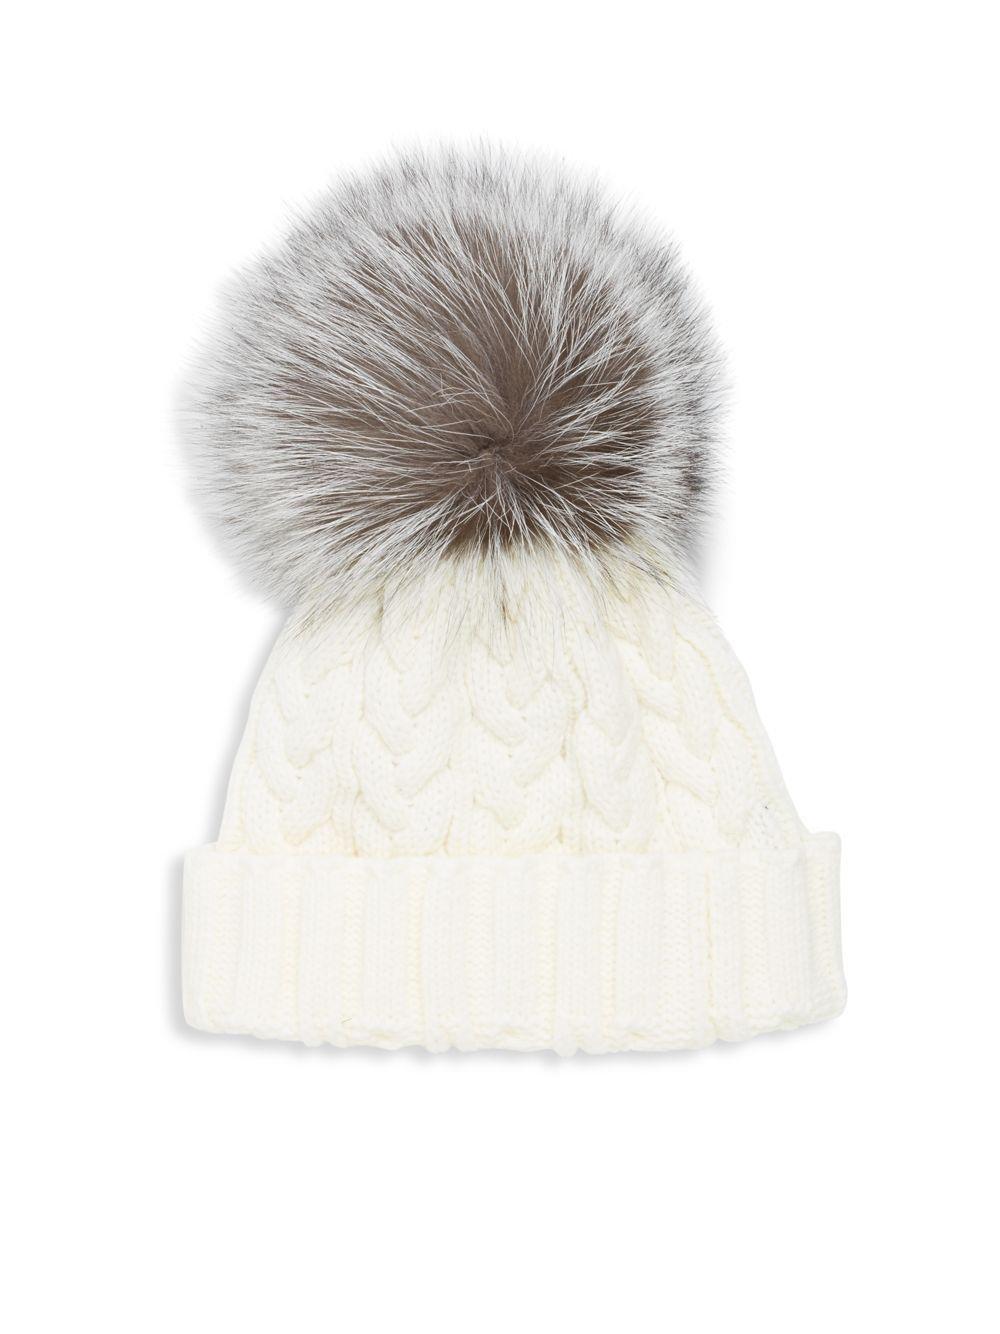 b2327b2918d7d8 Adrienne Landau Cable-knit Fox Fur Hat in White - Lyst